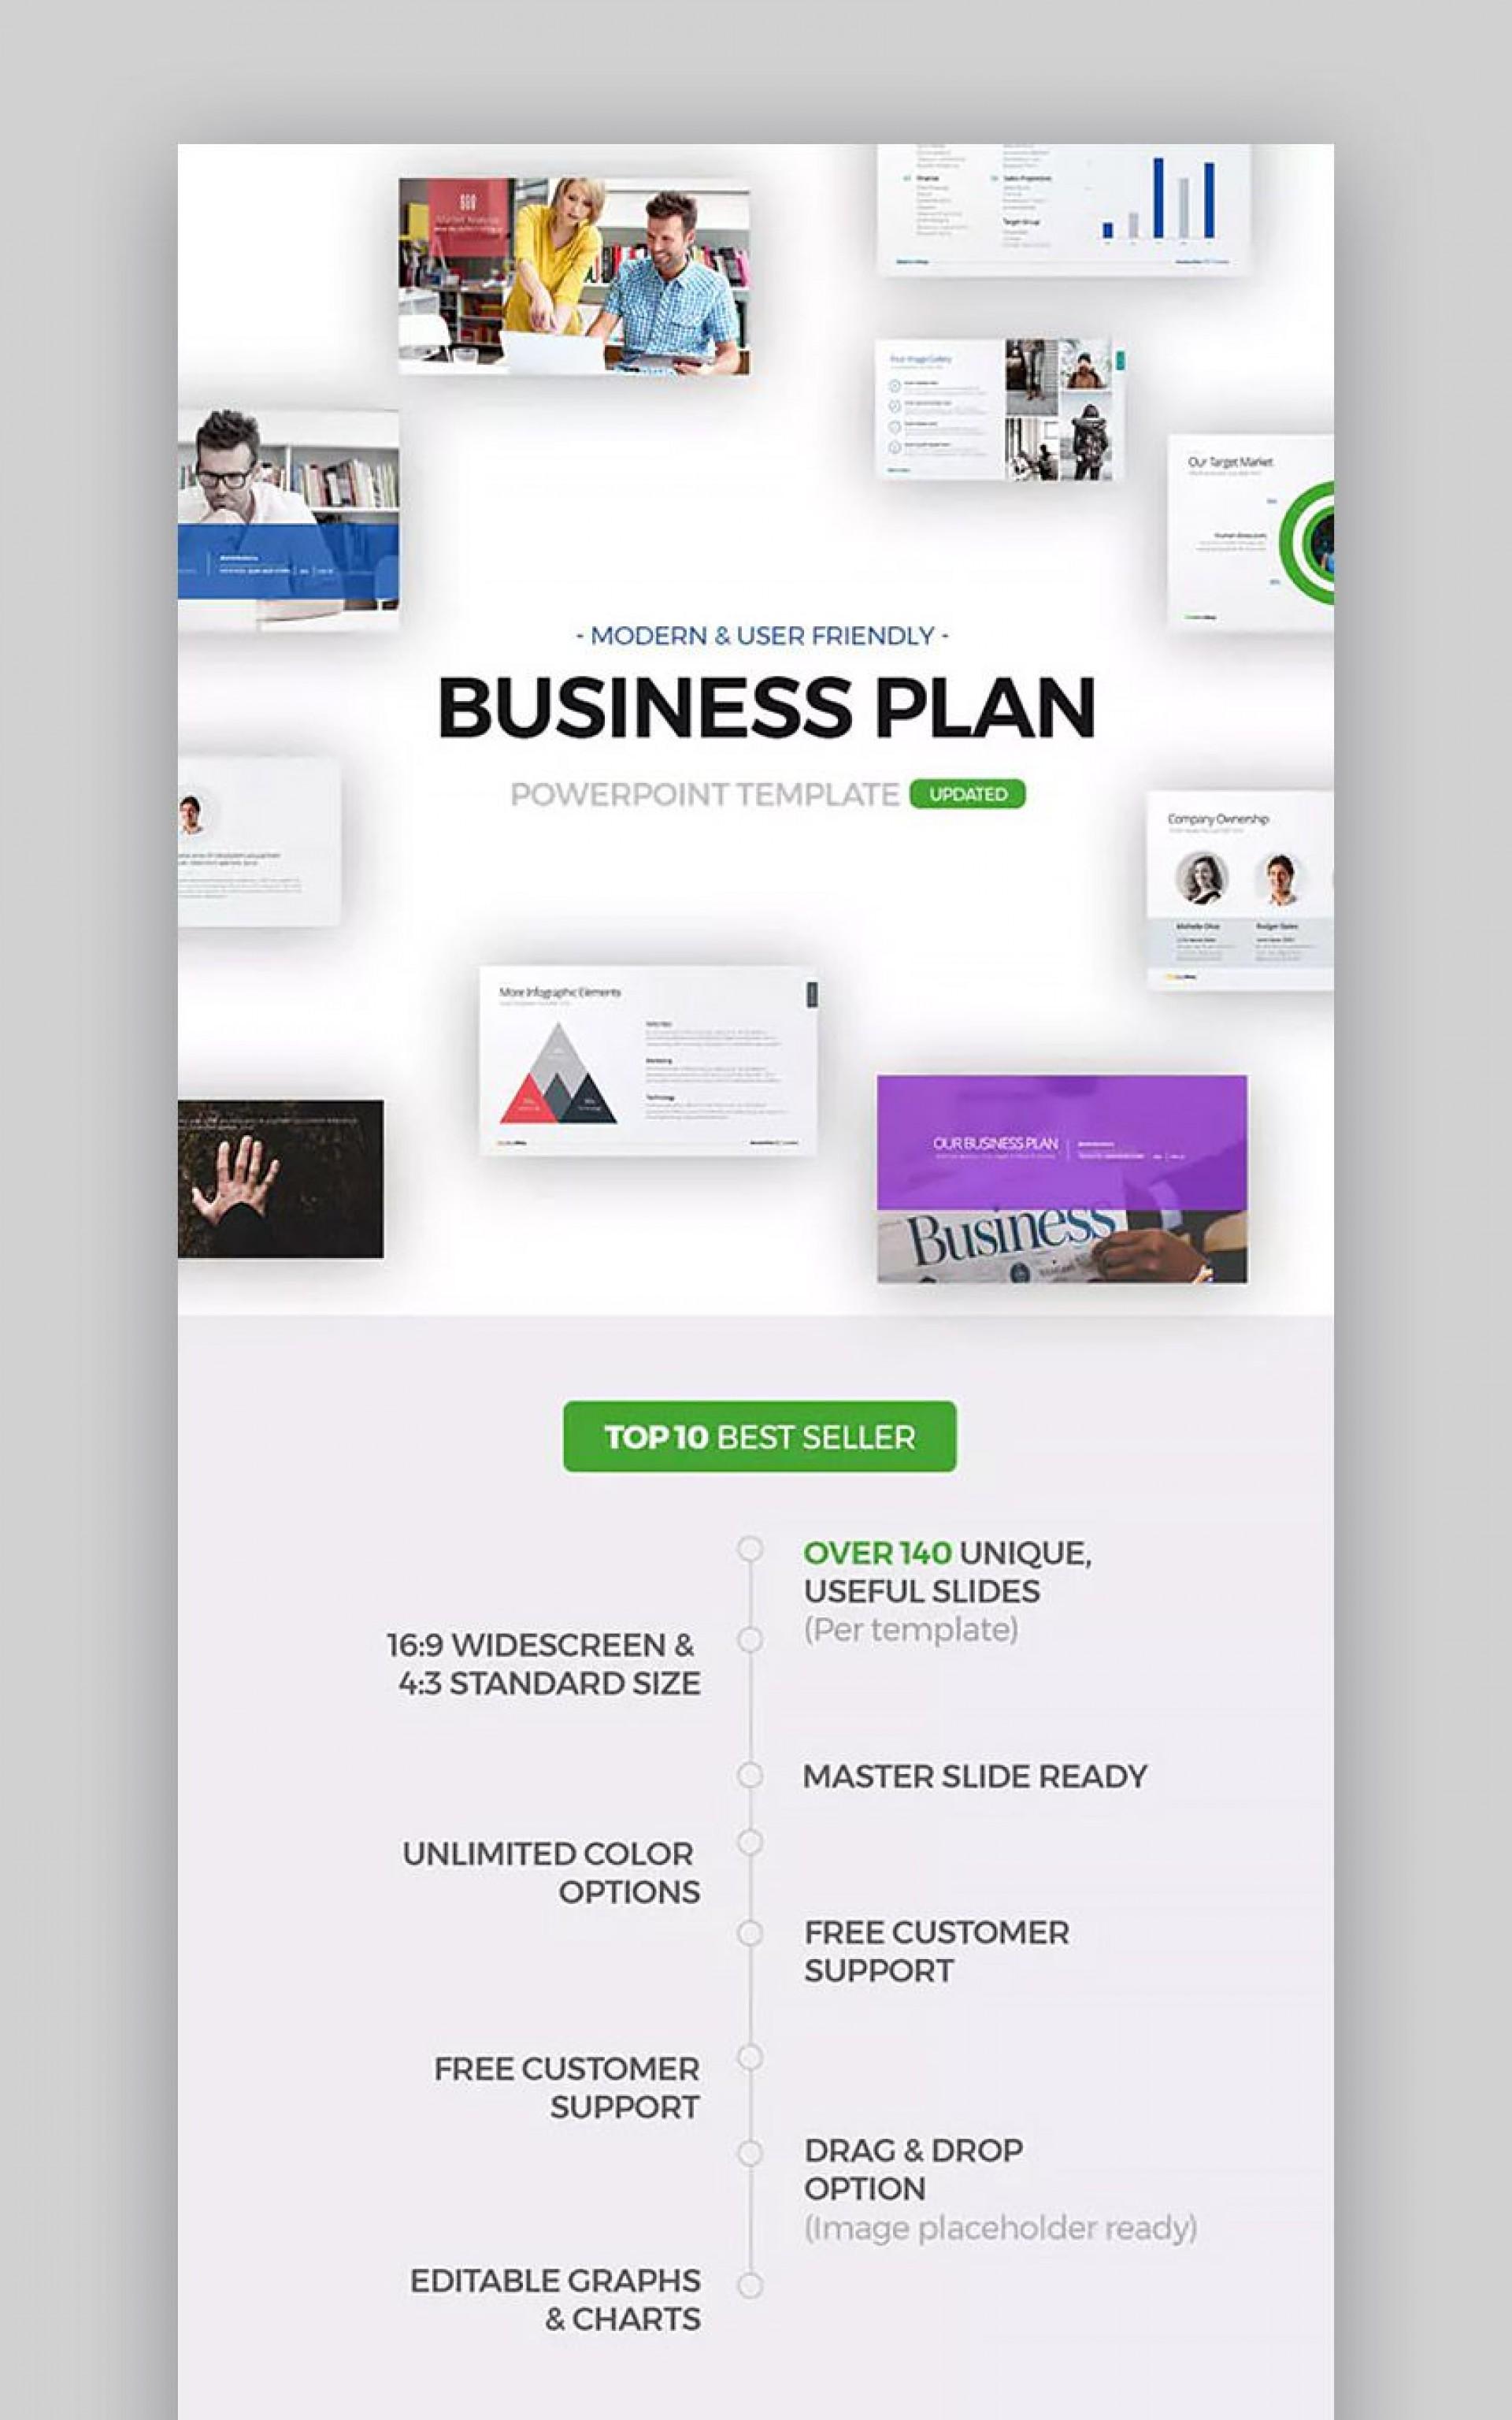 008 Shocking Small Restaurant Busines Plan Ppt Presentation Inspiration  Powerpoint1920